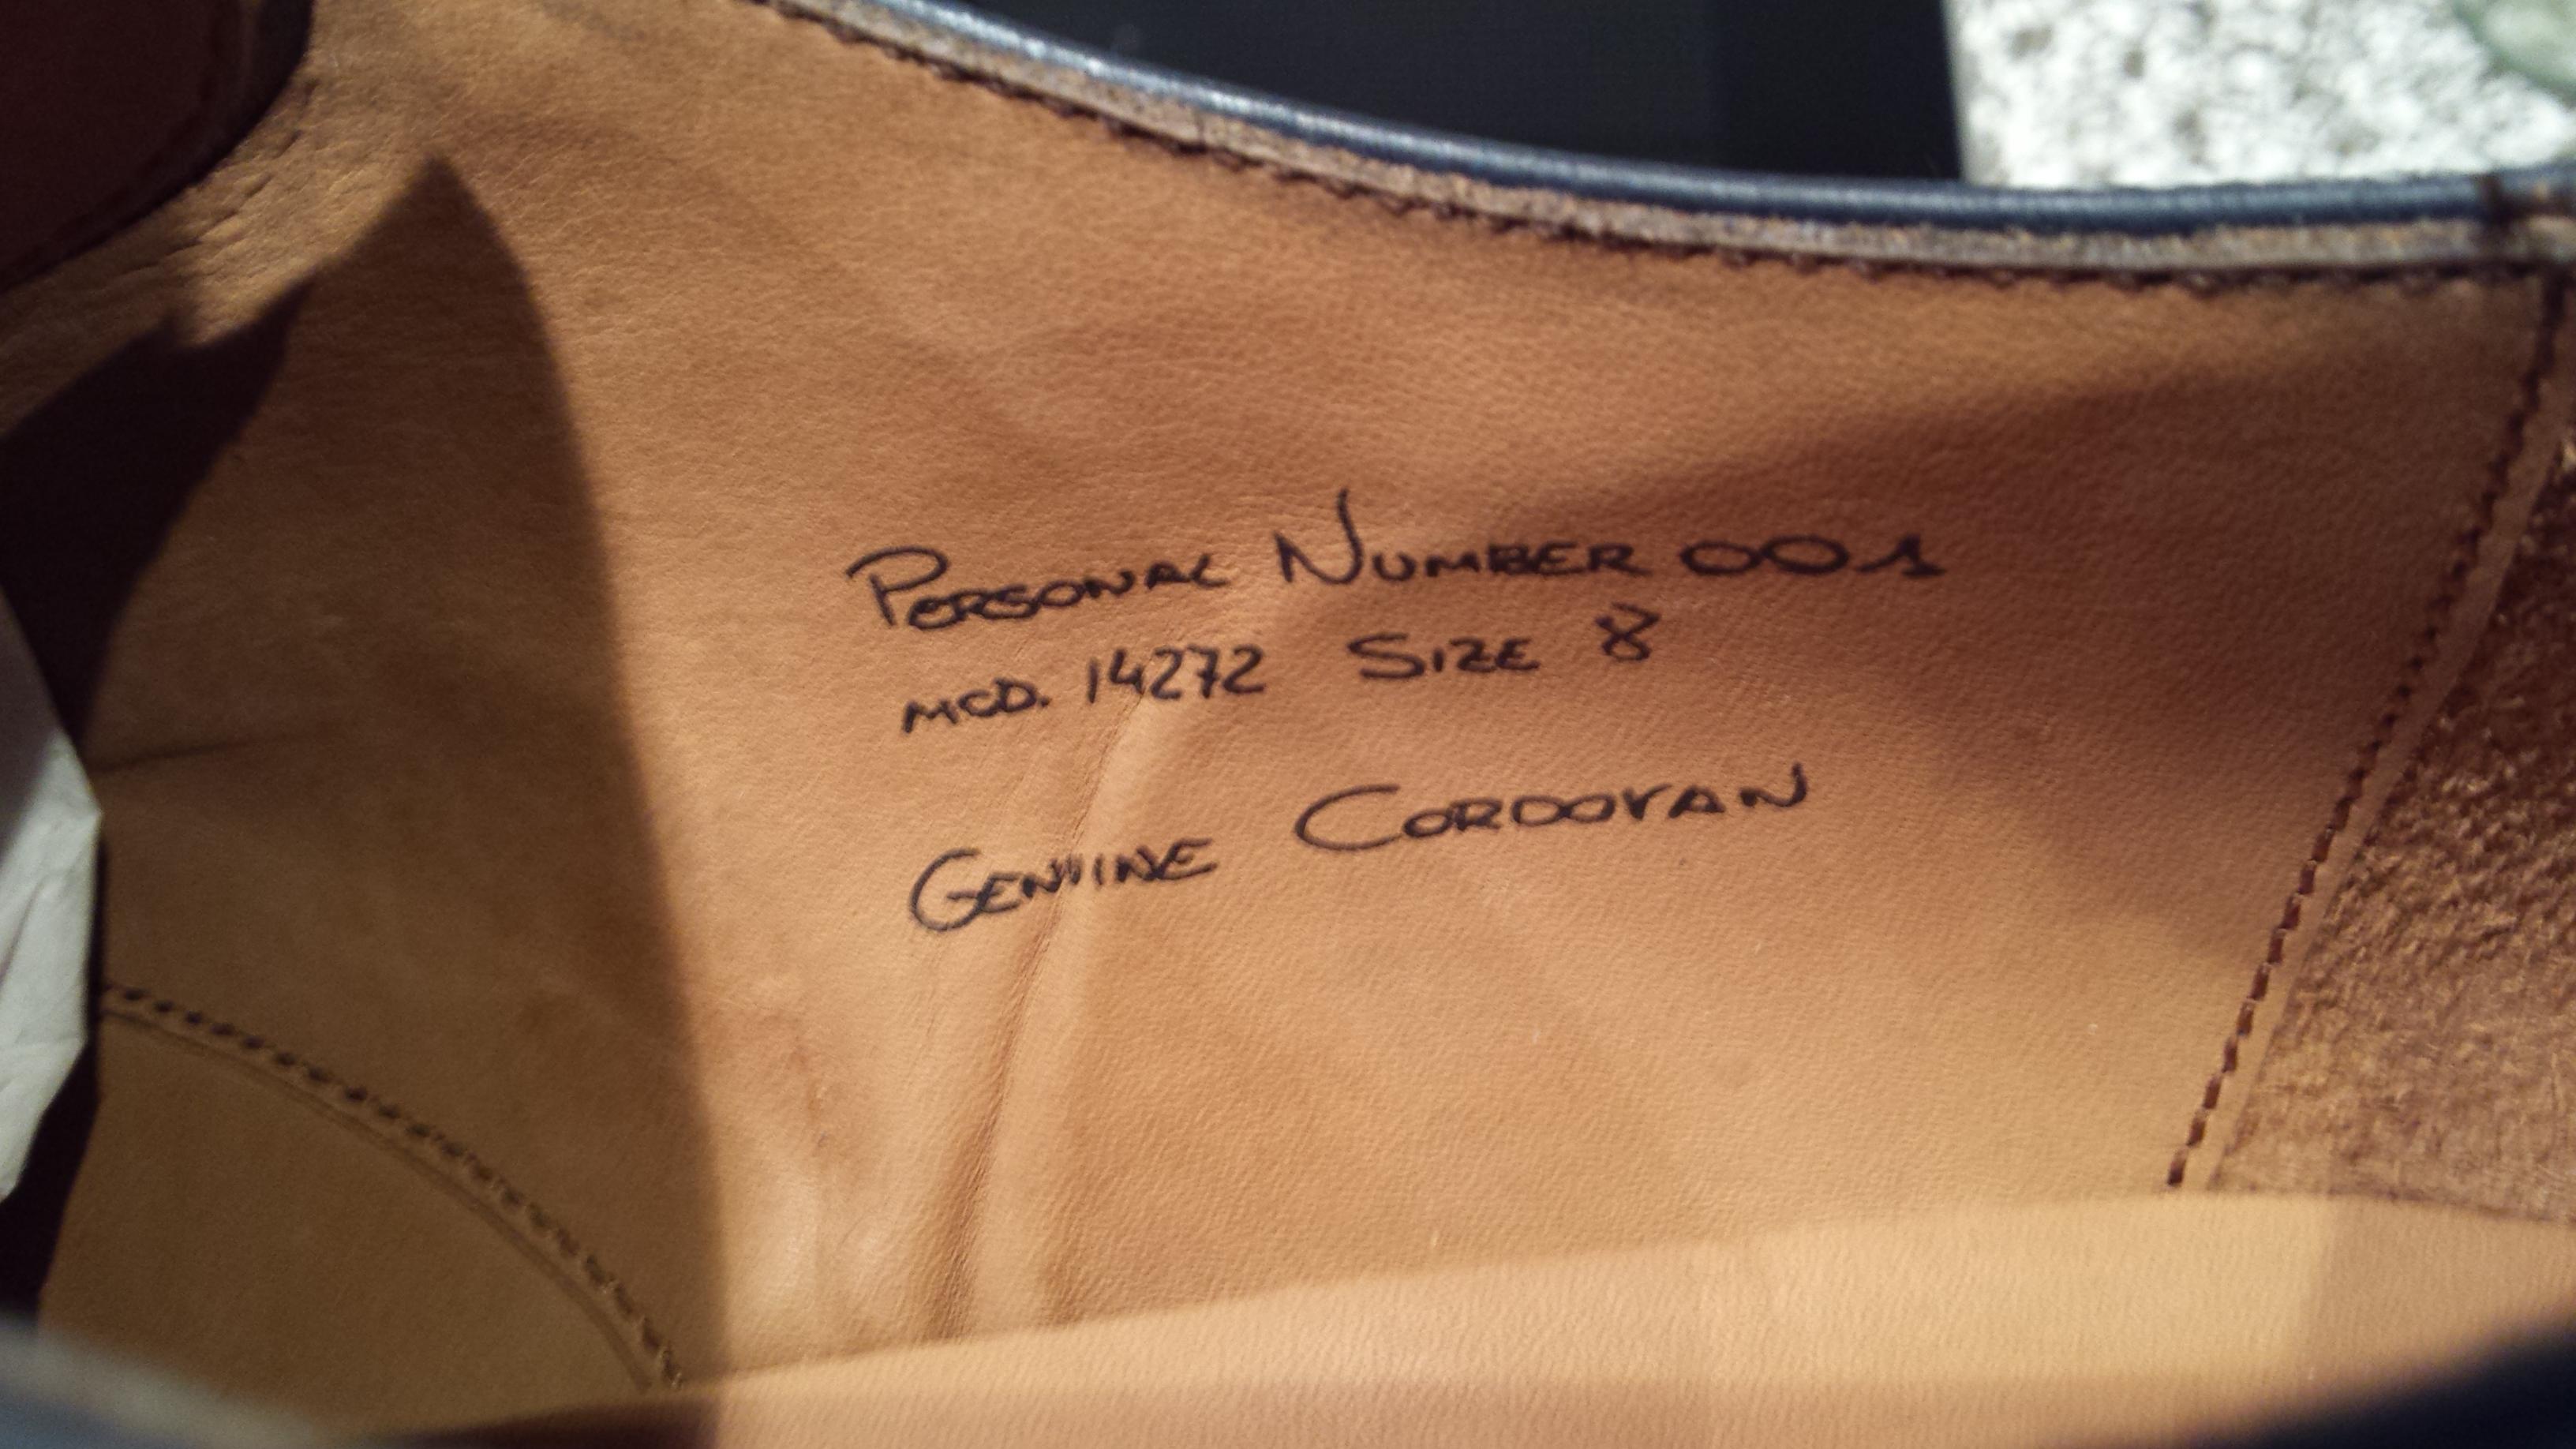 Schweino's photos in Yanko - Made In Spain Shoes